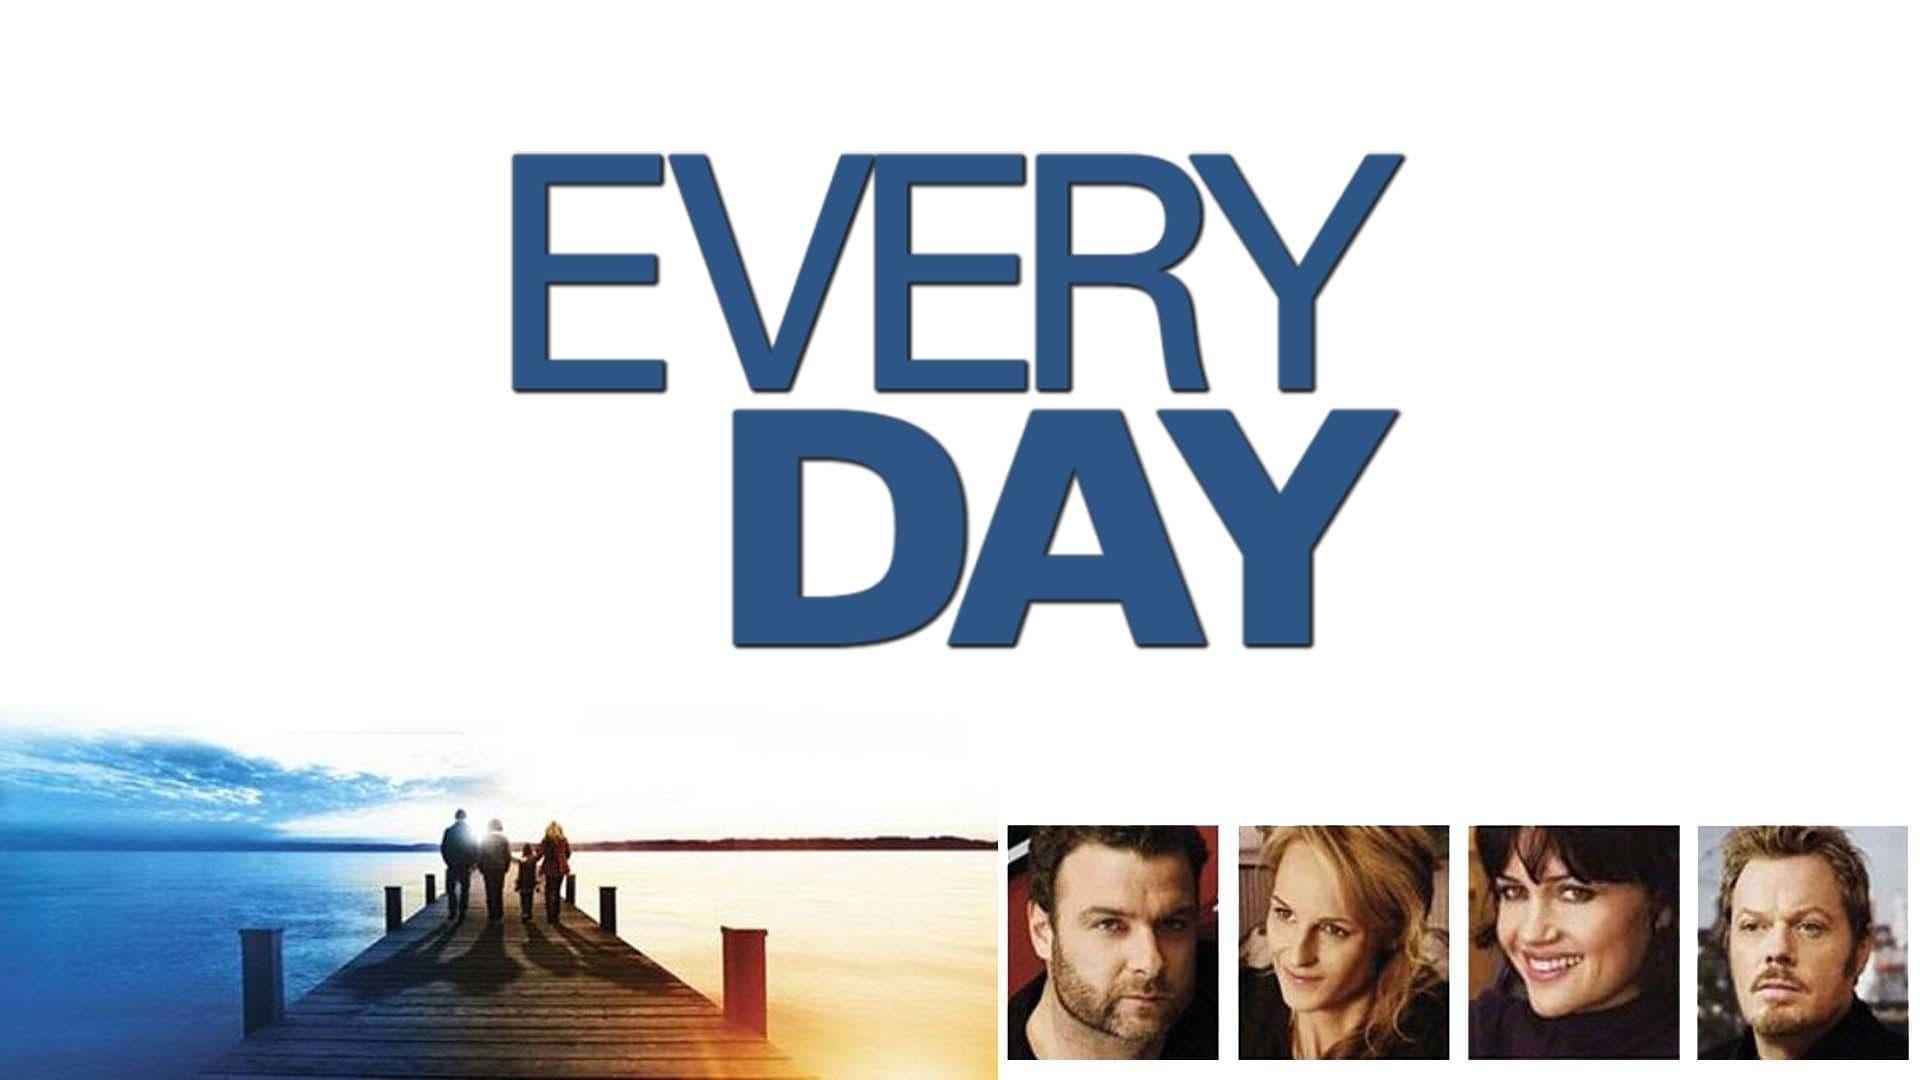 Watch Every Day (2010) Free Solar Movie Online - Watch ...